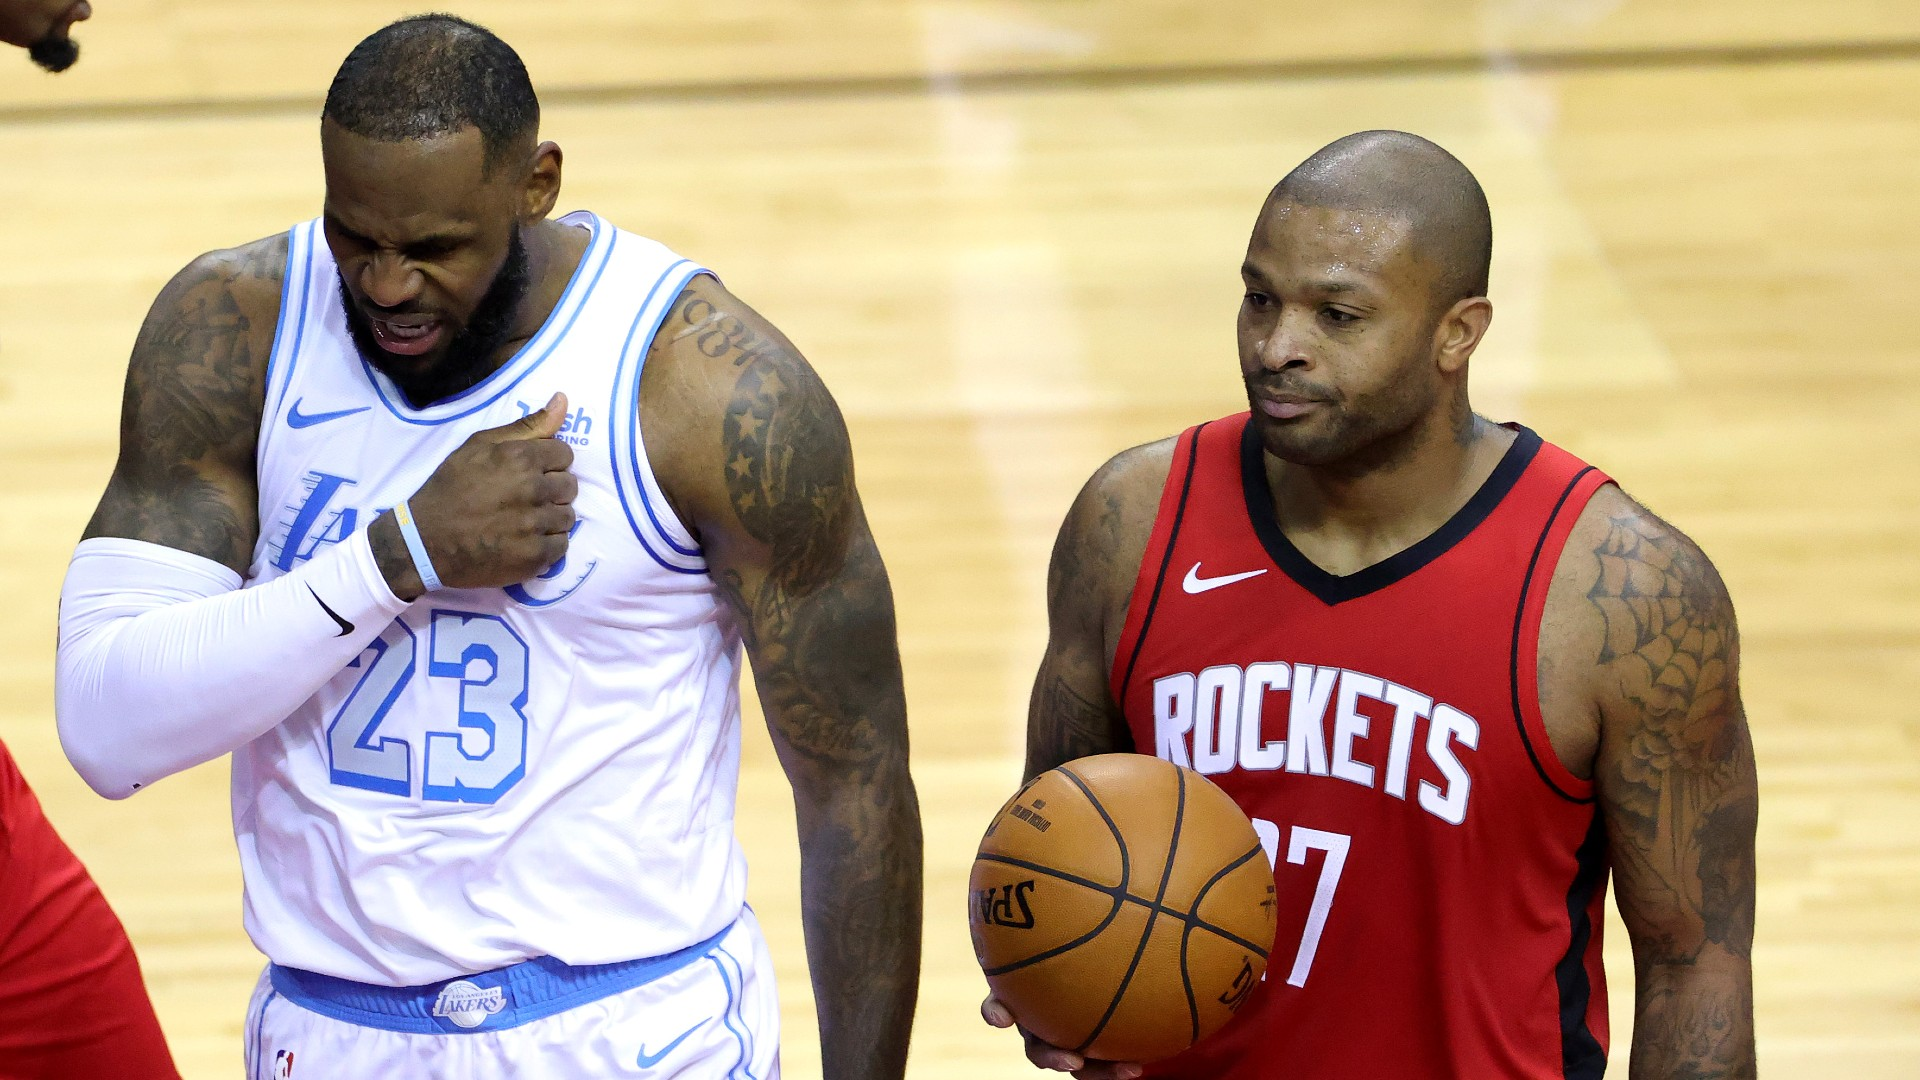 NBA trade rumors: Bucks, Lakers among teams expressing interest in Rockets' P.J. Tucker